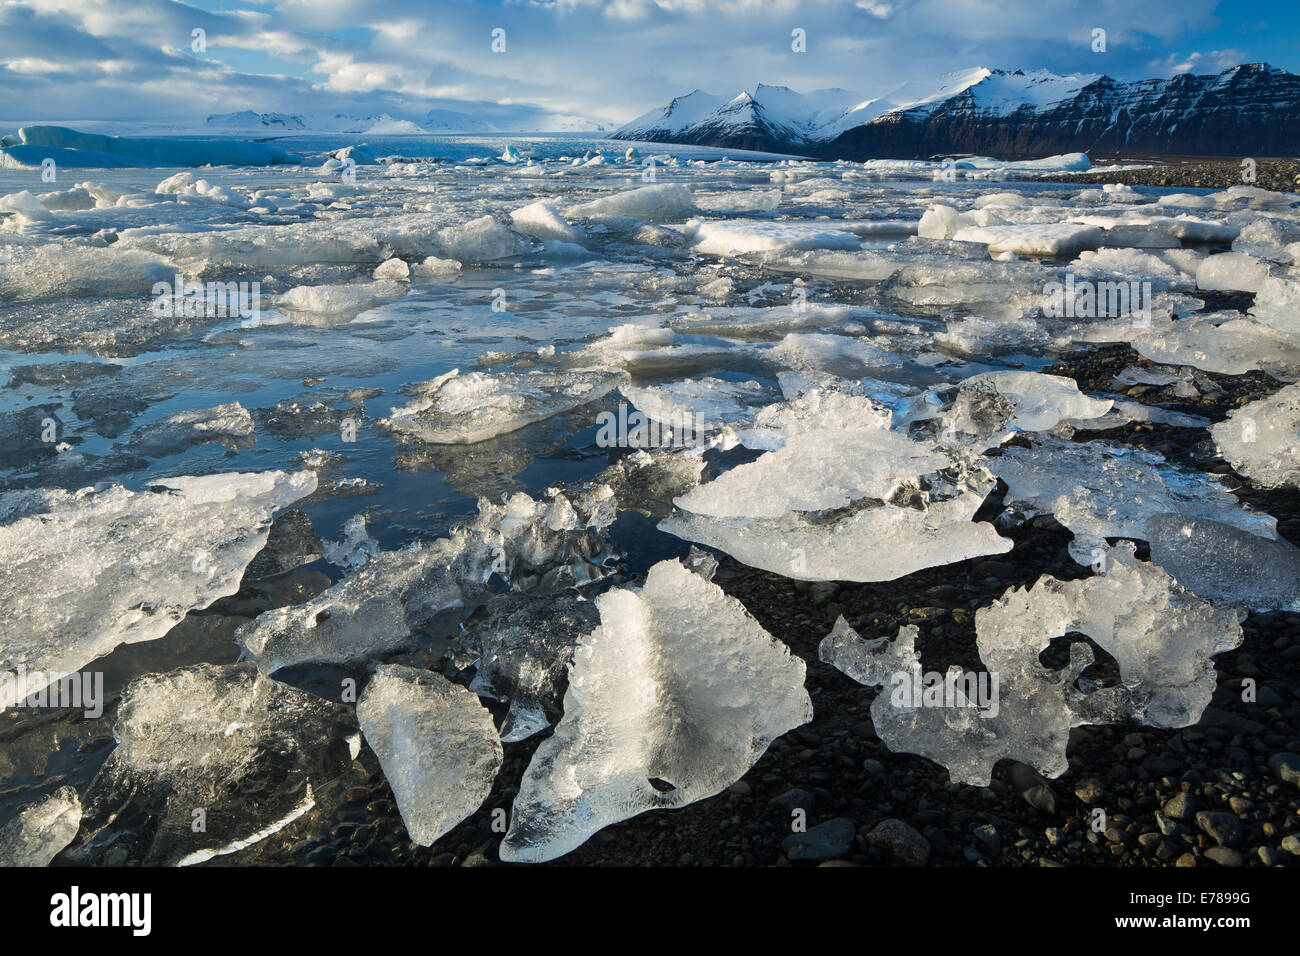 Jökulsárlón glacial lagoon, eastern Iceland - Stock Image